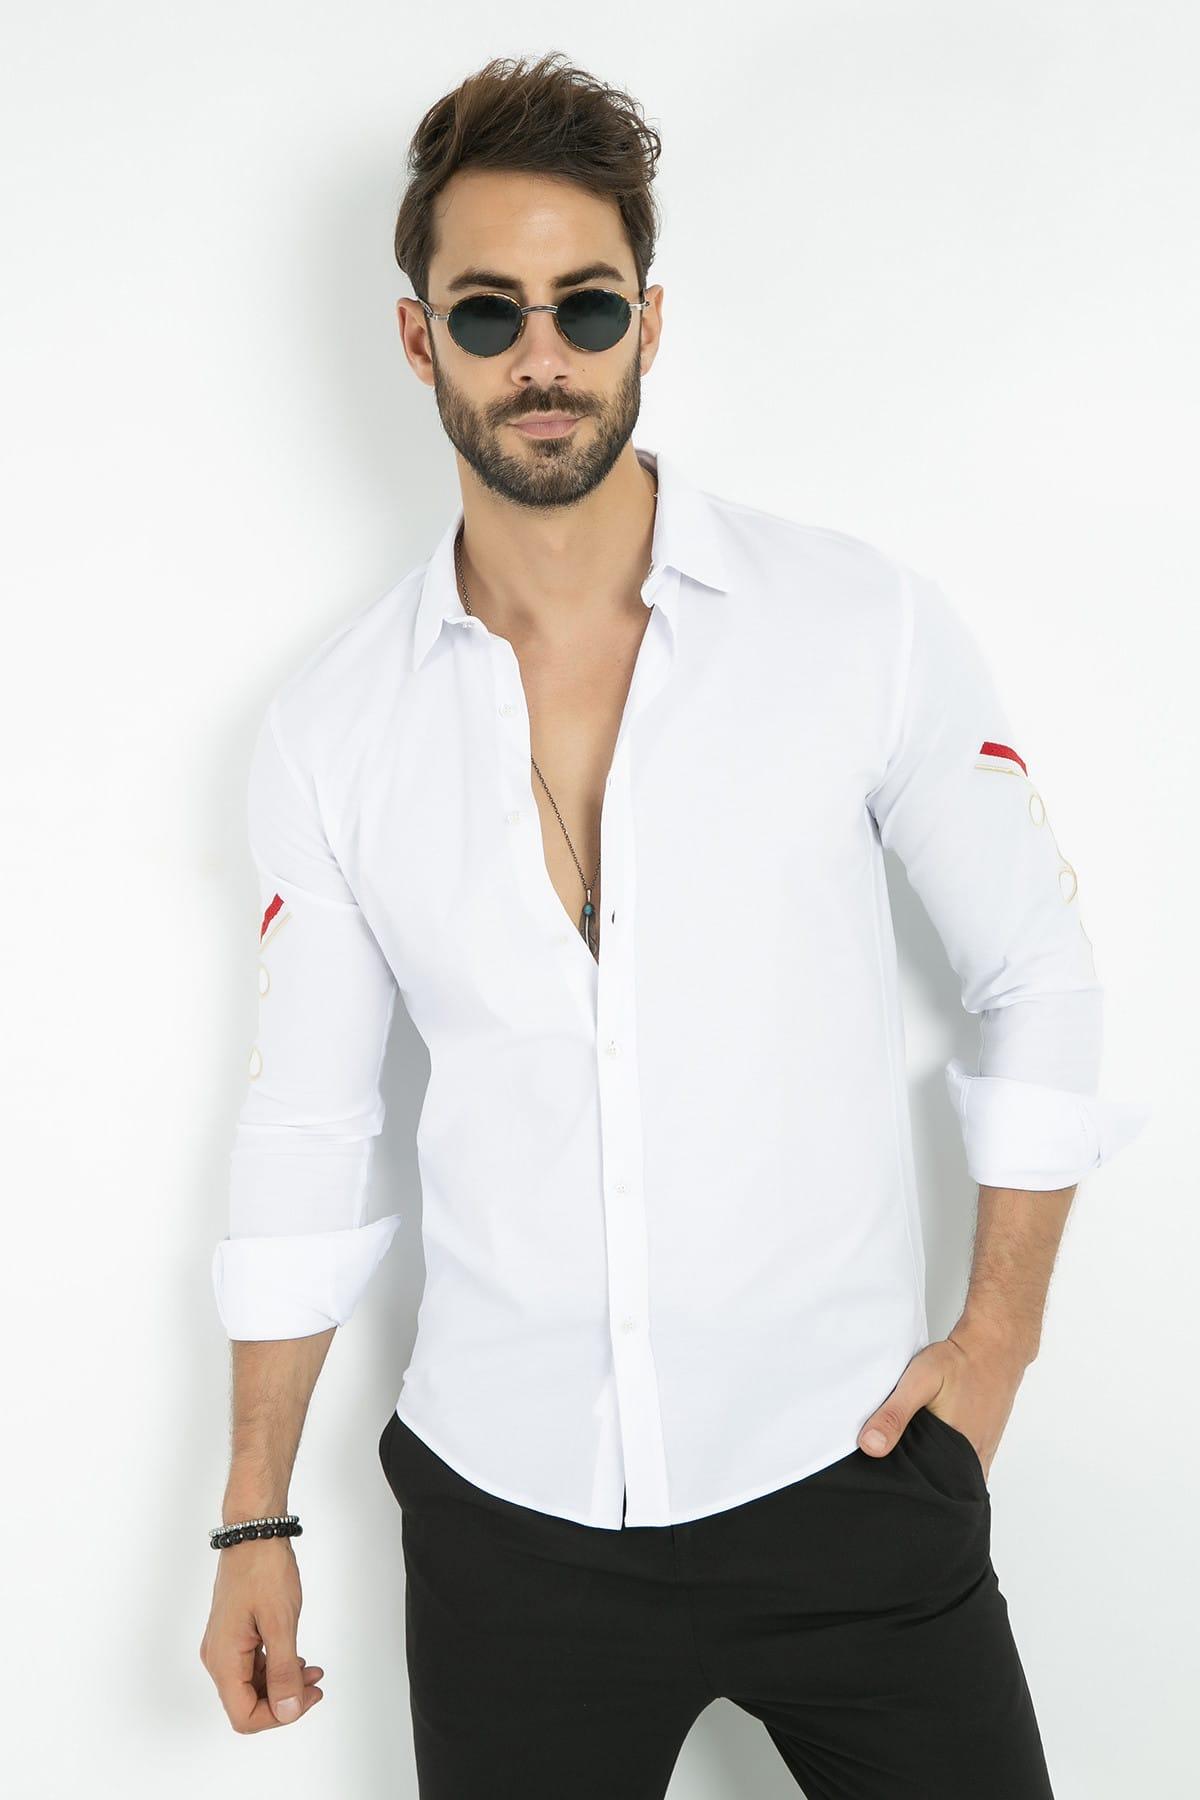 خرید انلاین پیراهن جدید مردانه شیک برند Sateen Men کد ty4485991